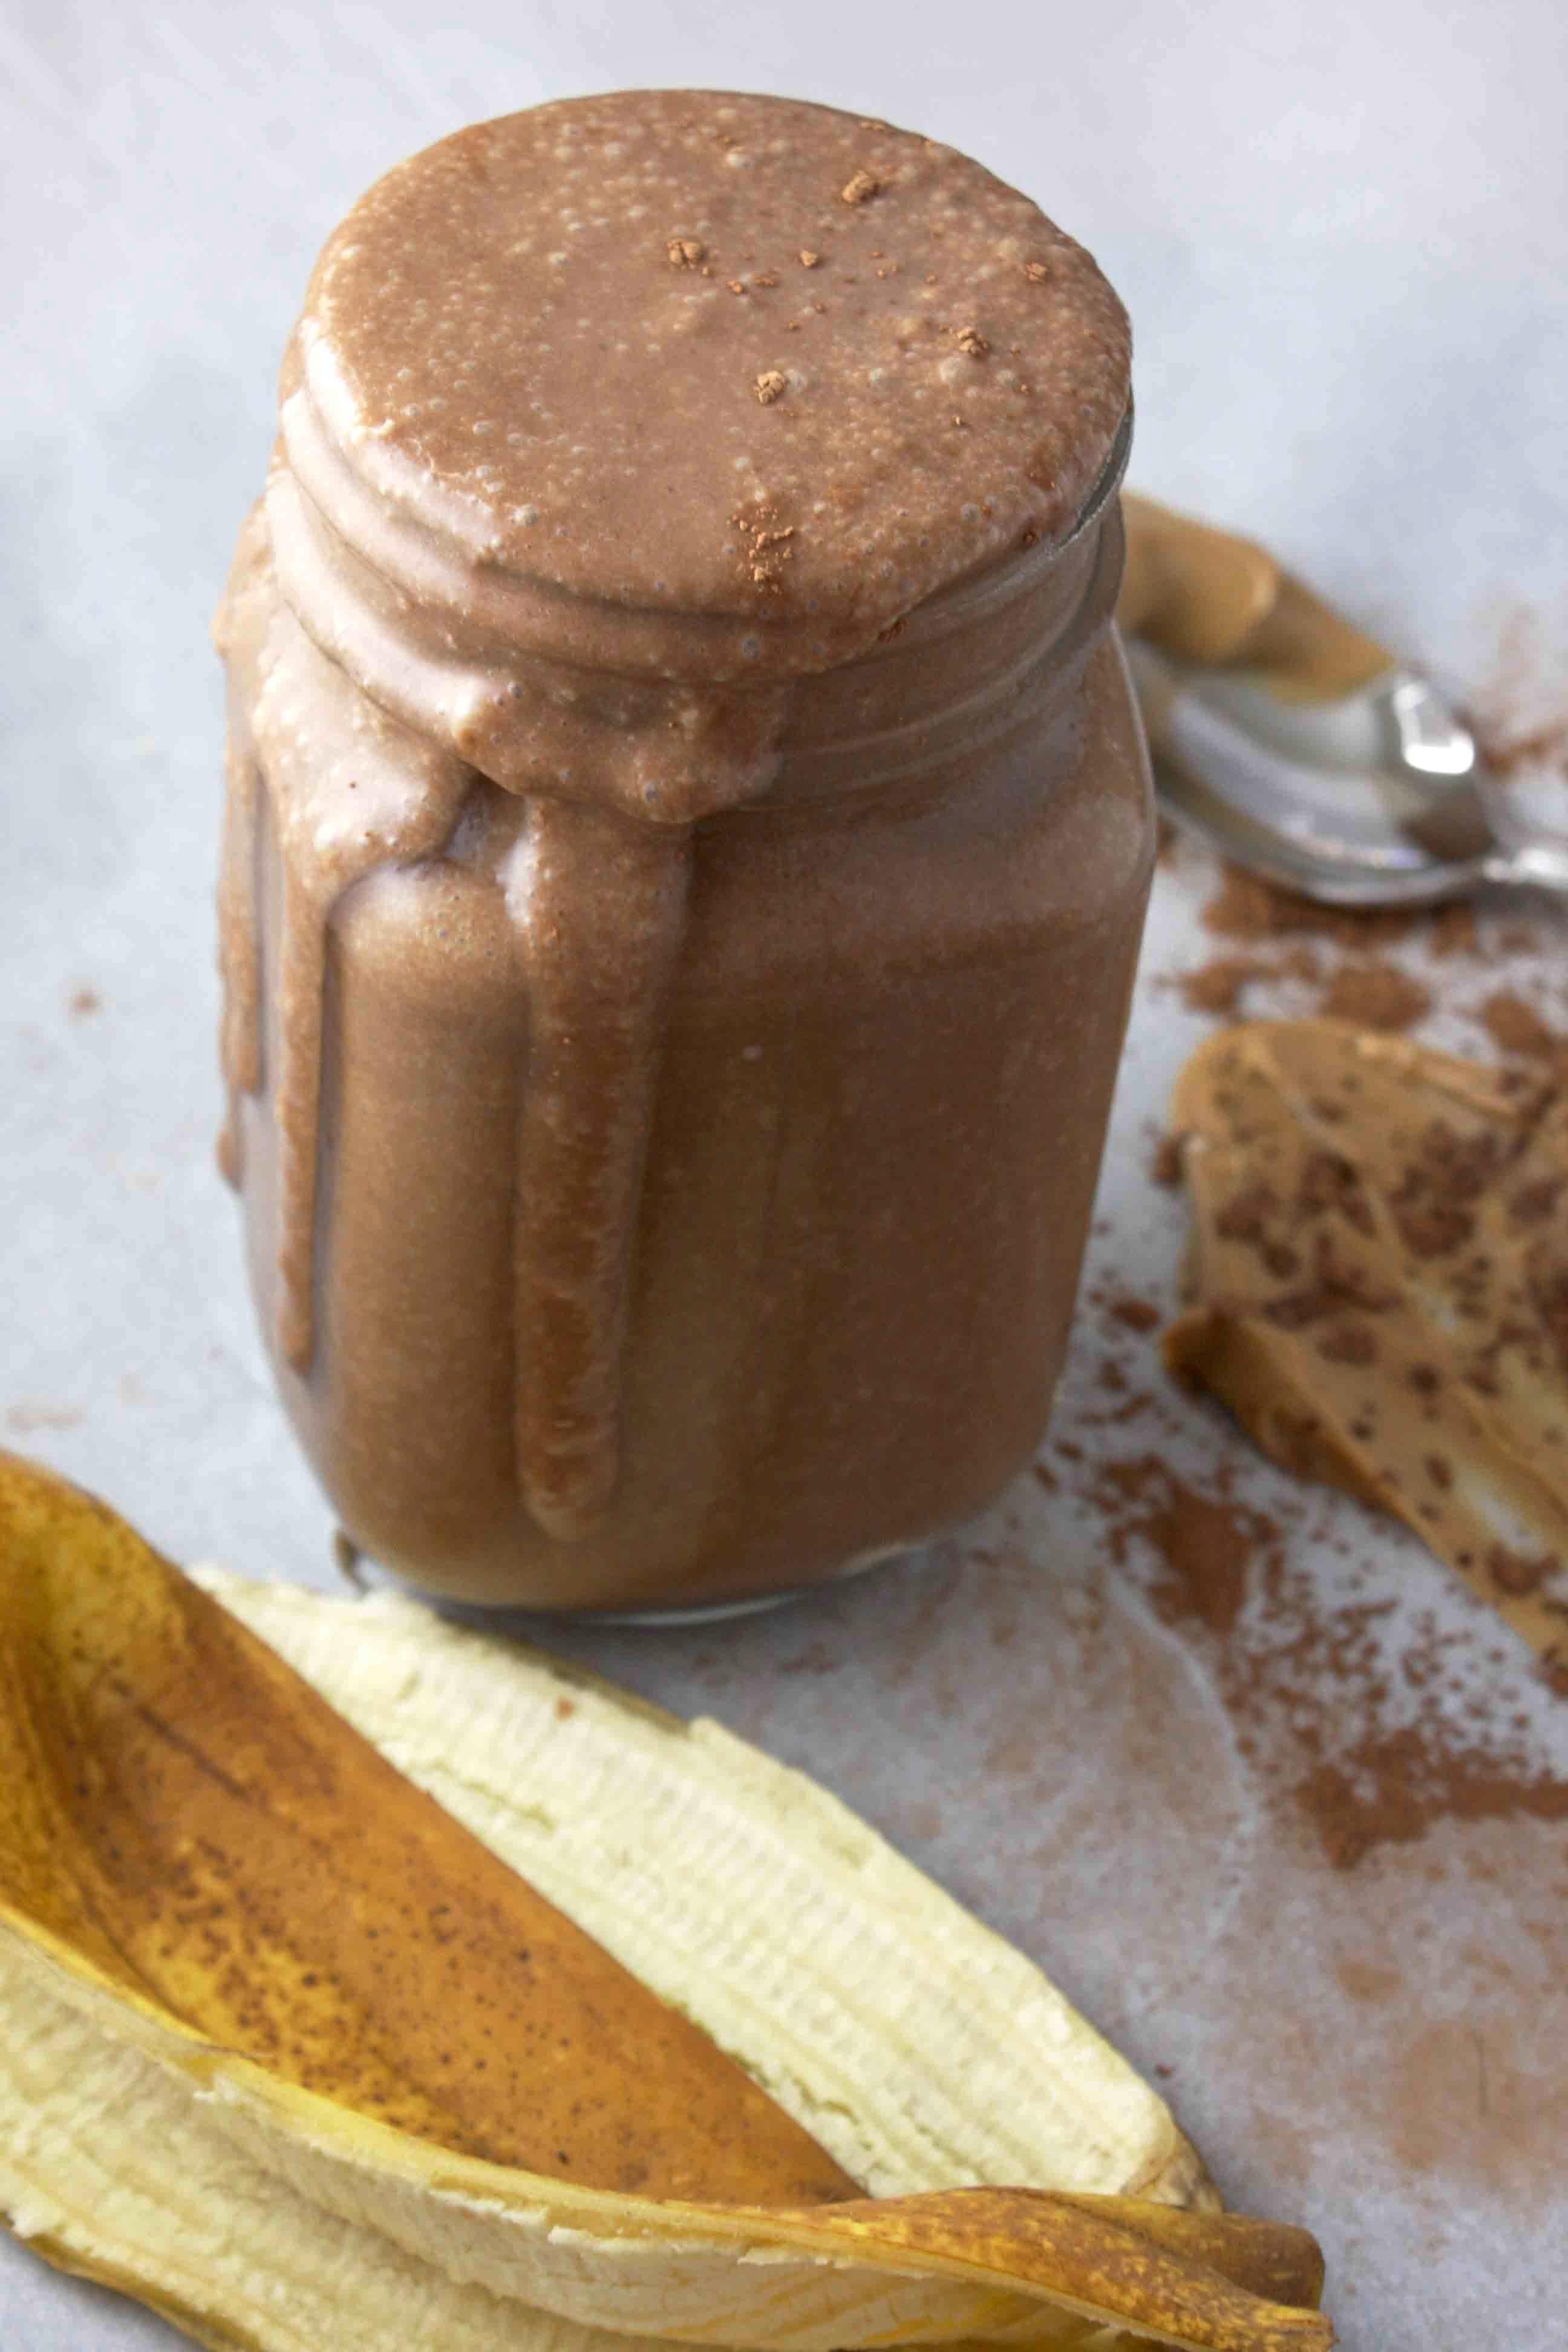 how to make a thick chocolate milkshake